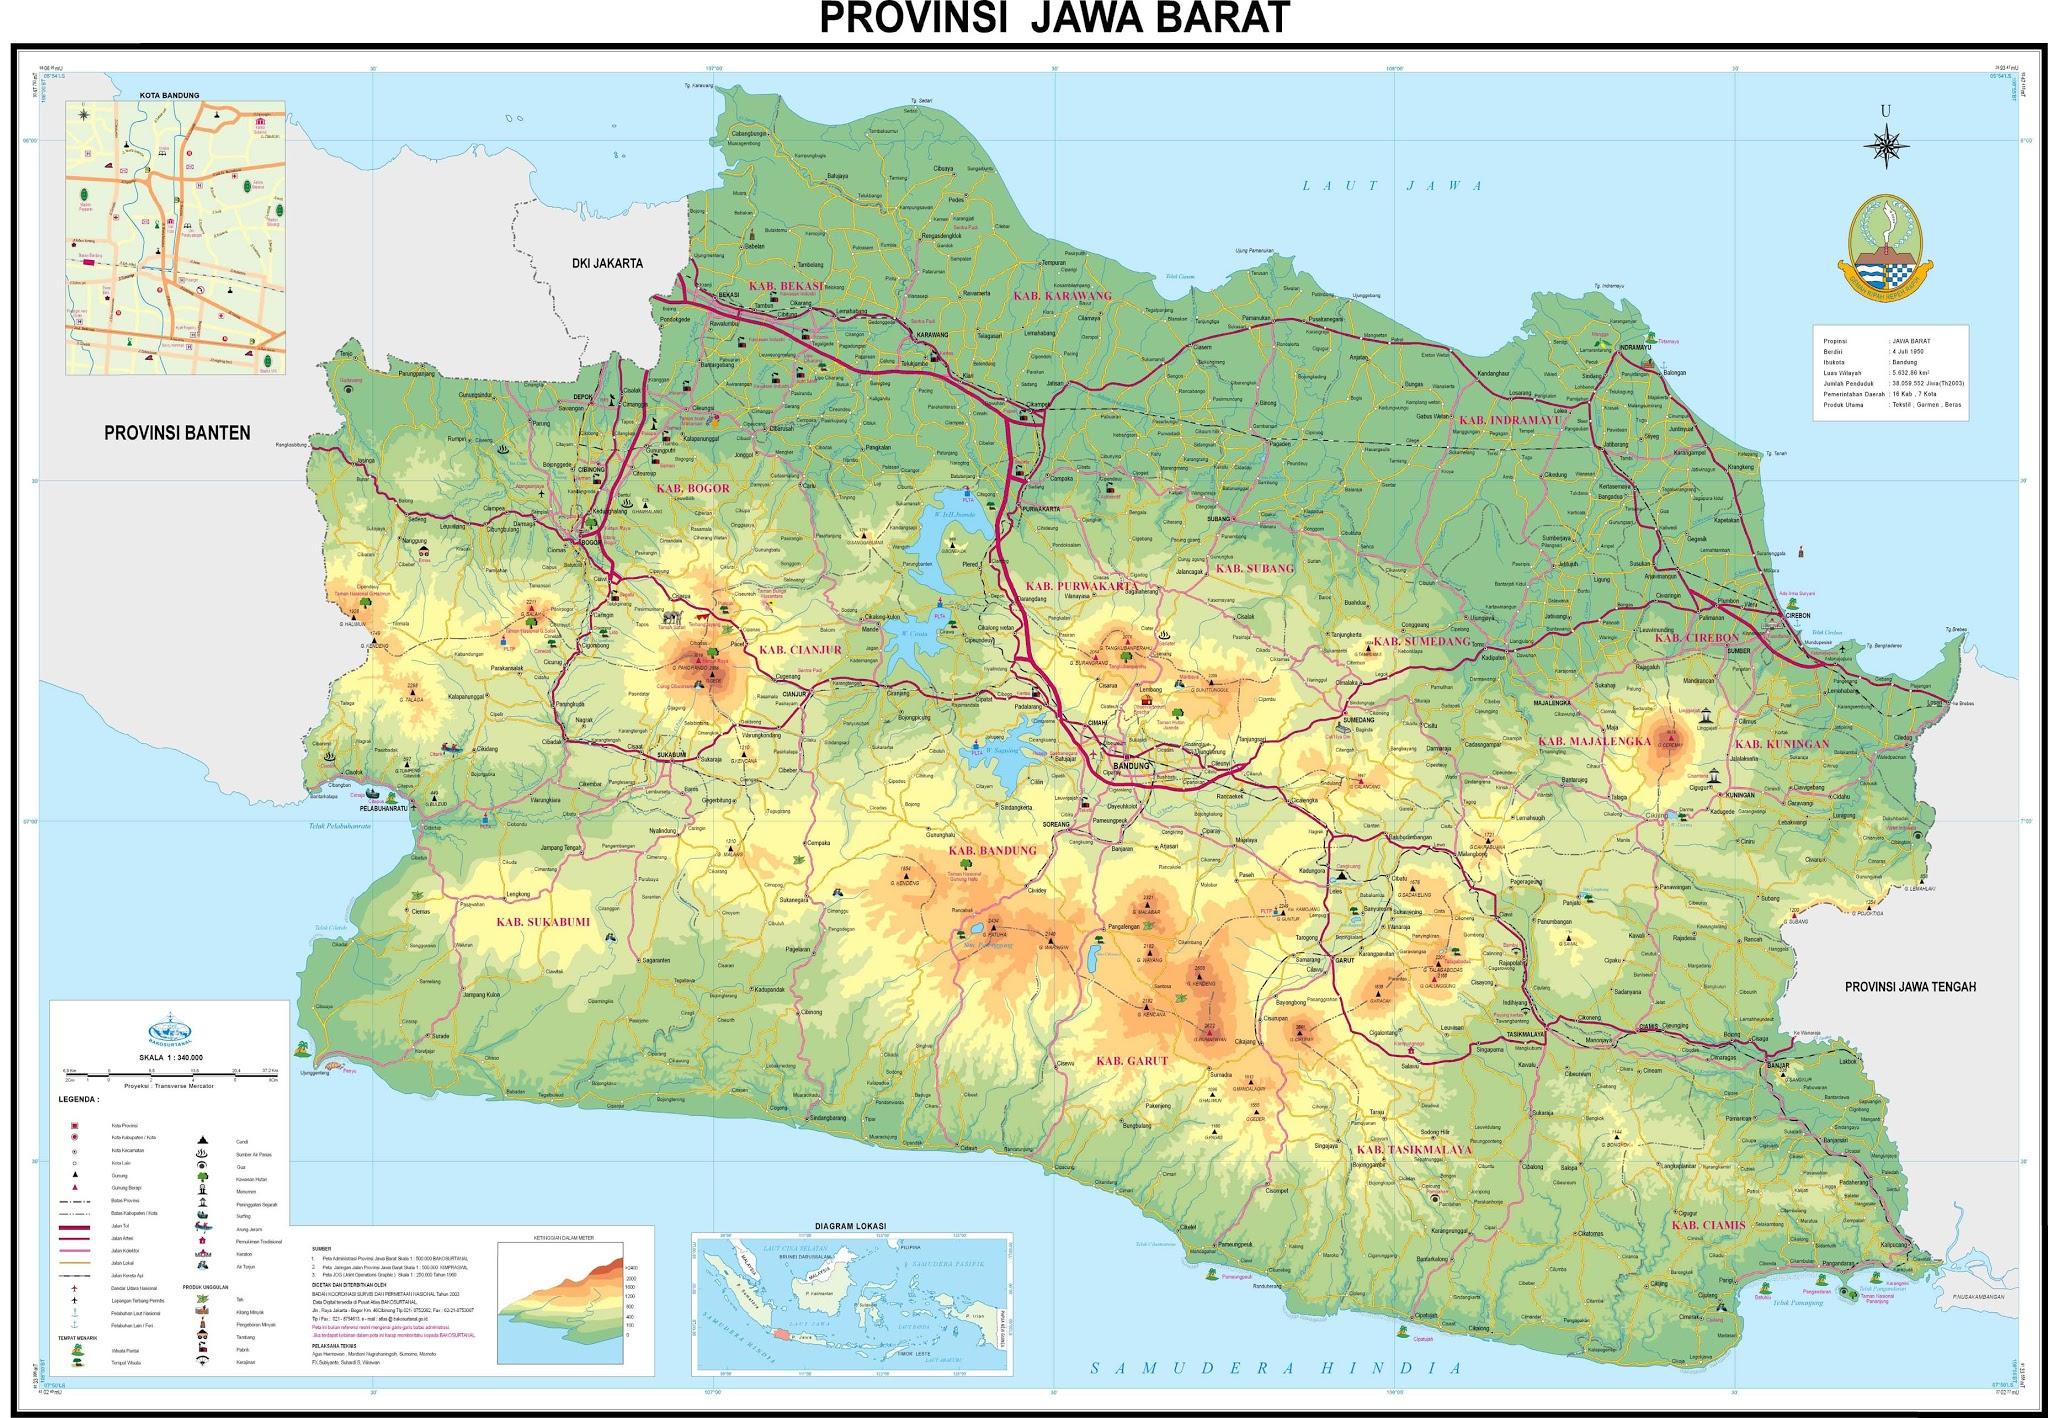 Peta Kota Jawa Barat Hd Gambar